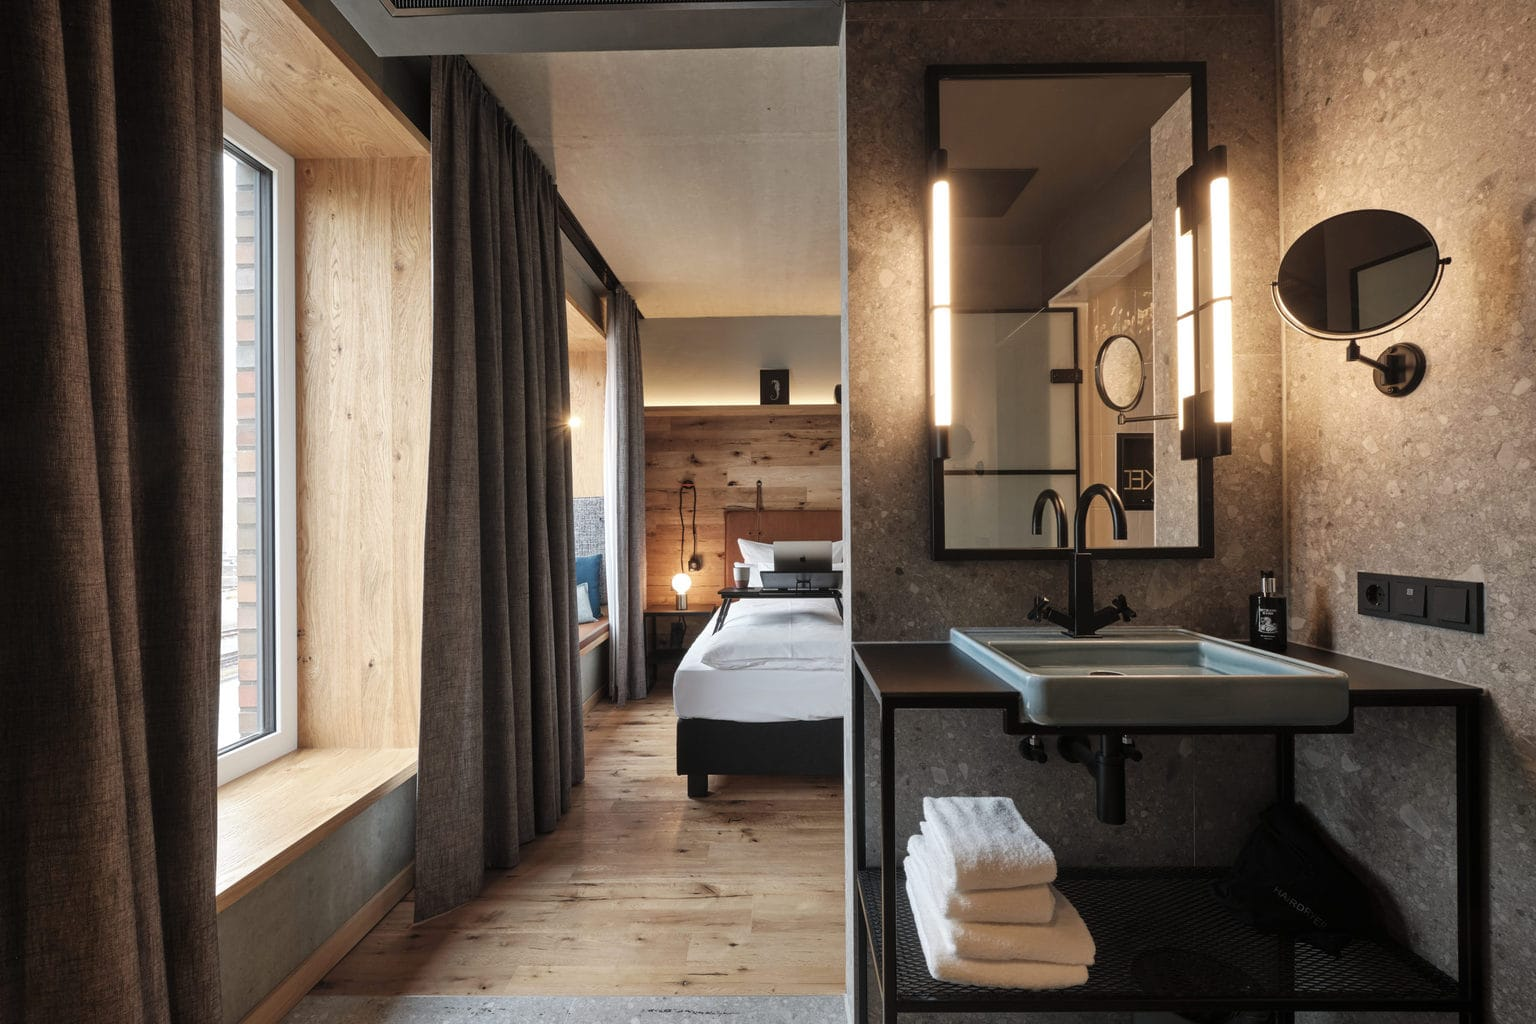 Badkamer en slaapkamer met strak design in het me and all hotel in Kiel